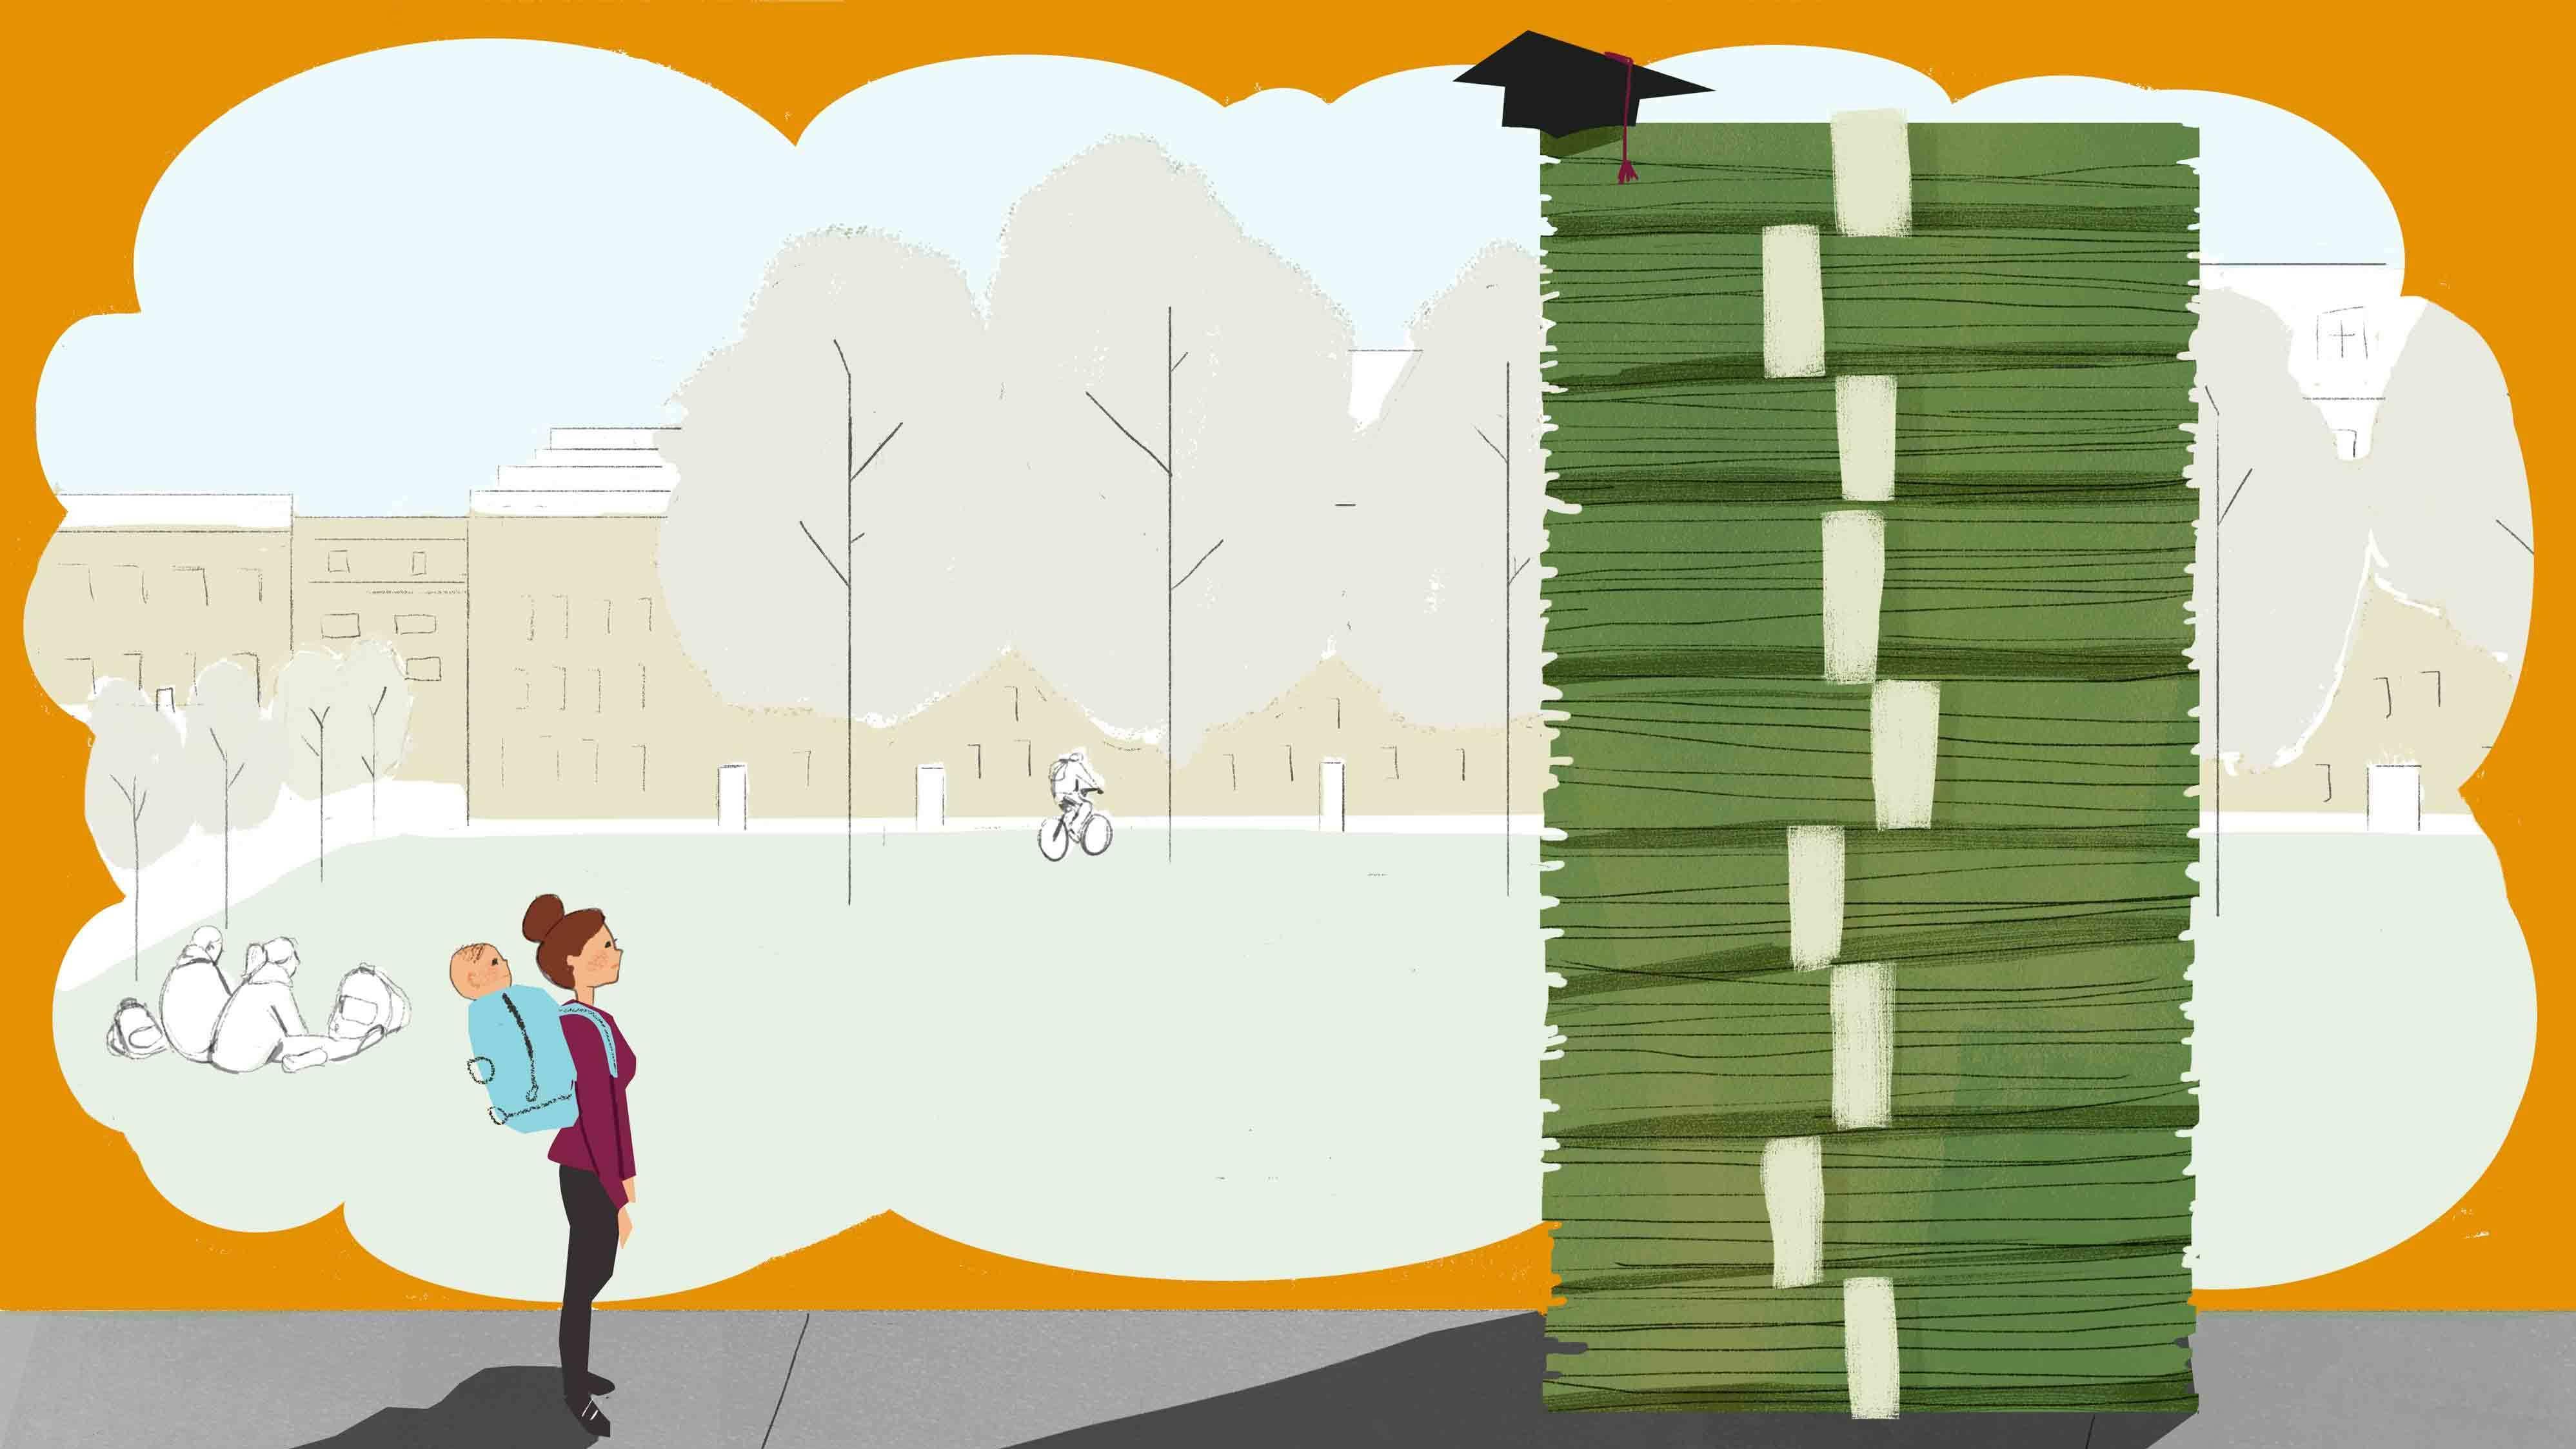 npr.org - New Data About Student Loan Borrowers; DeVos Changes Obama-era Guidance